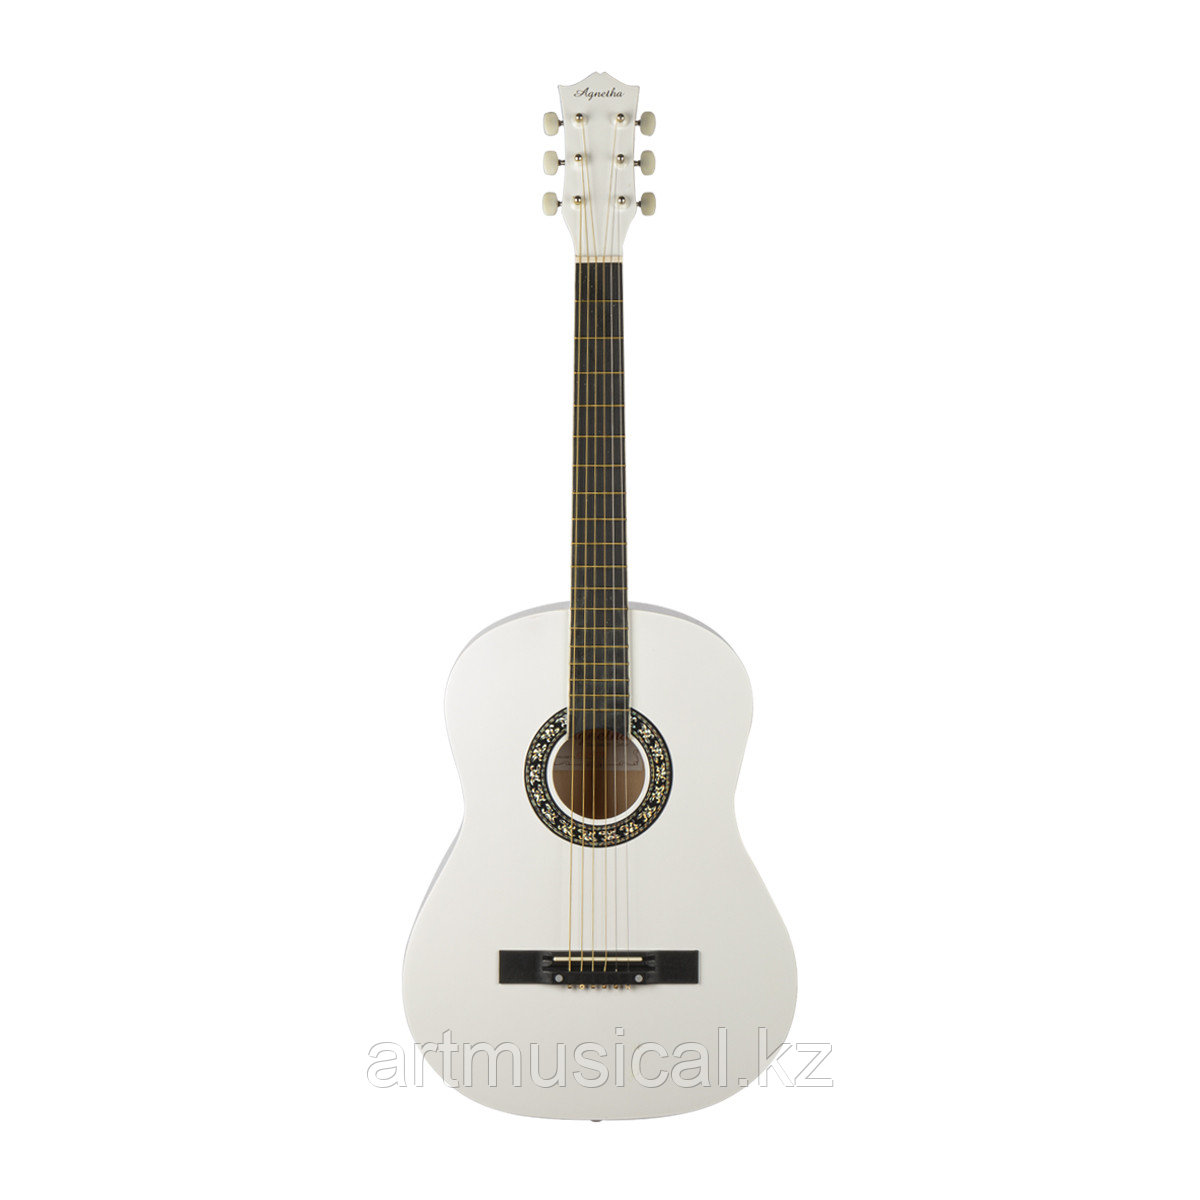 Гитара Agnetha APG-E110 WH